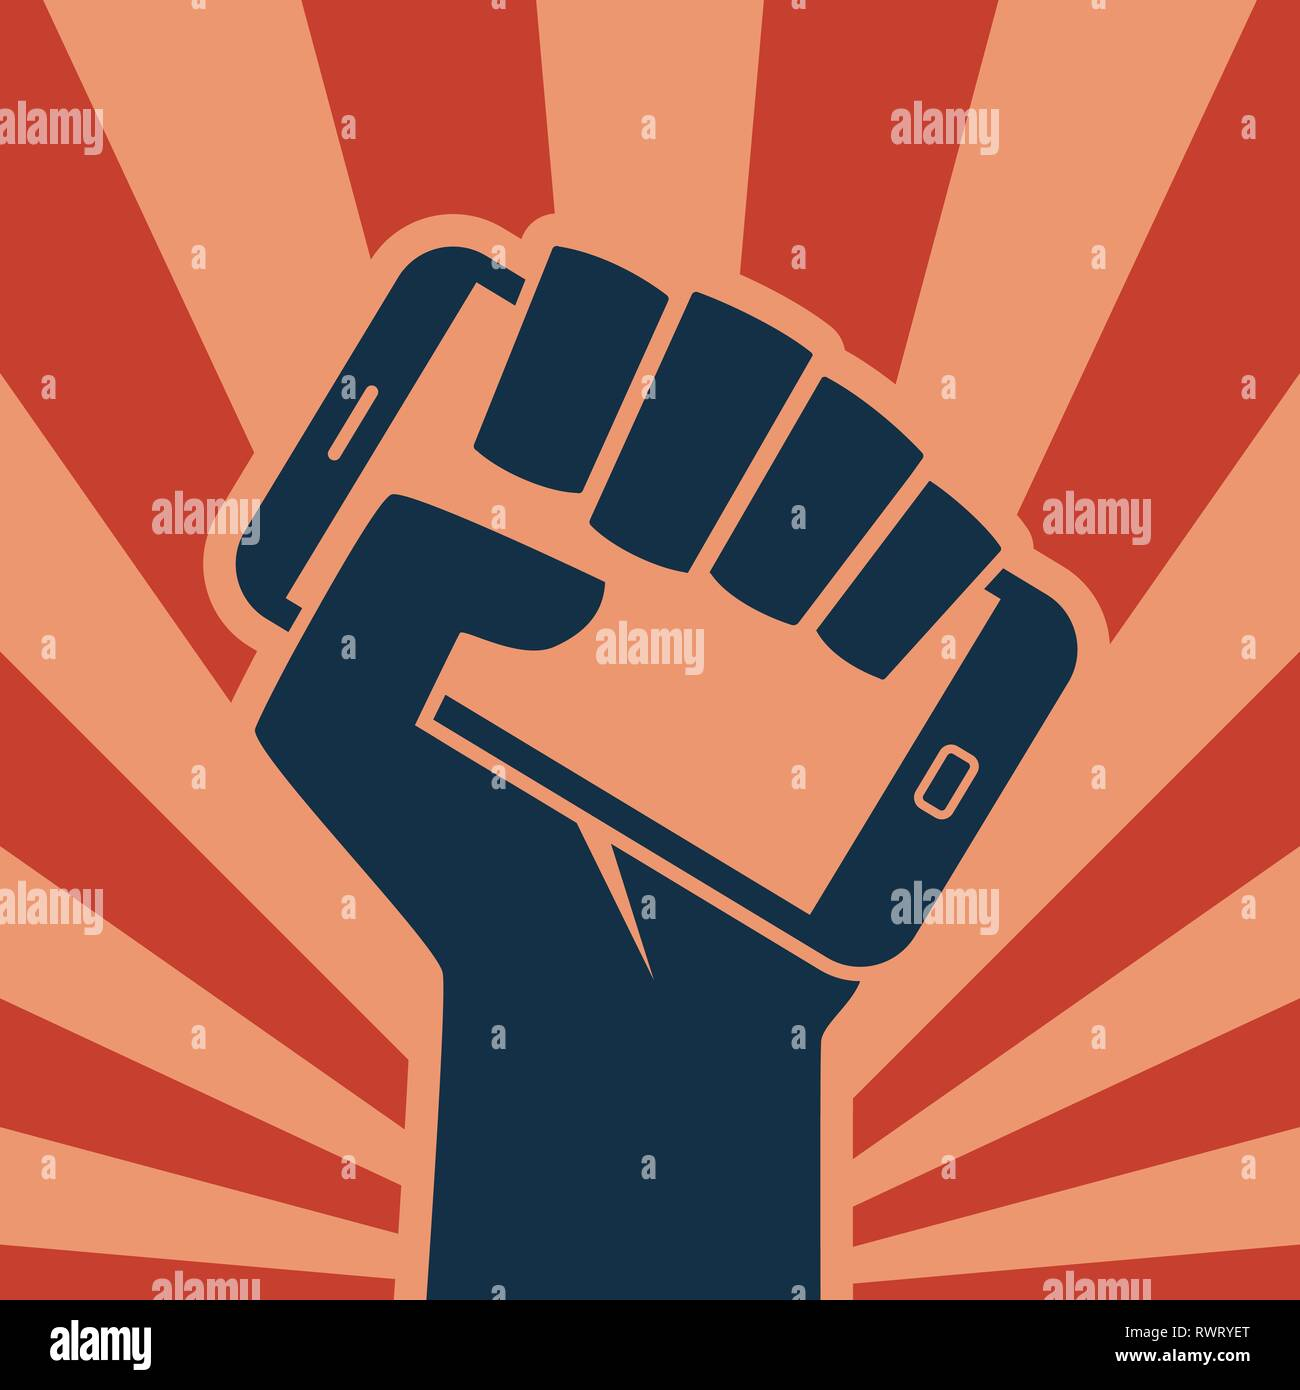 Hand holding smartphone like call to digital revolution retro style icon - Stock Vector